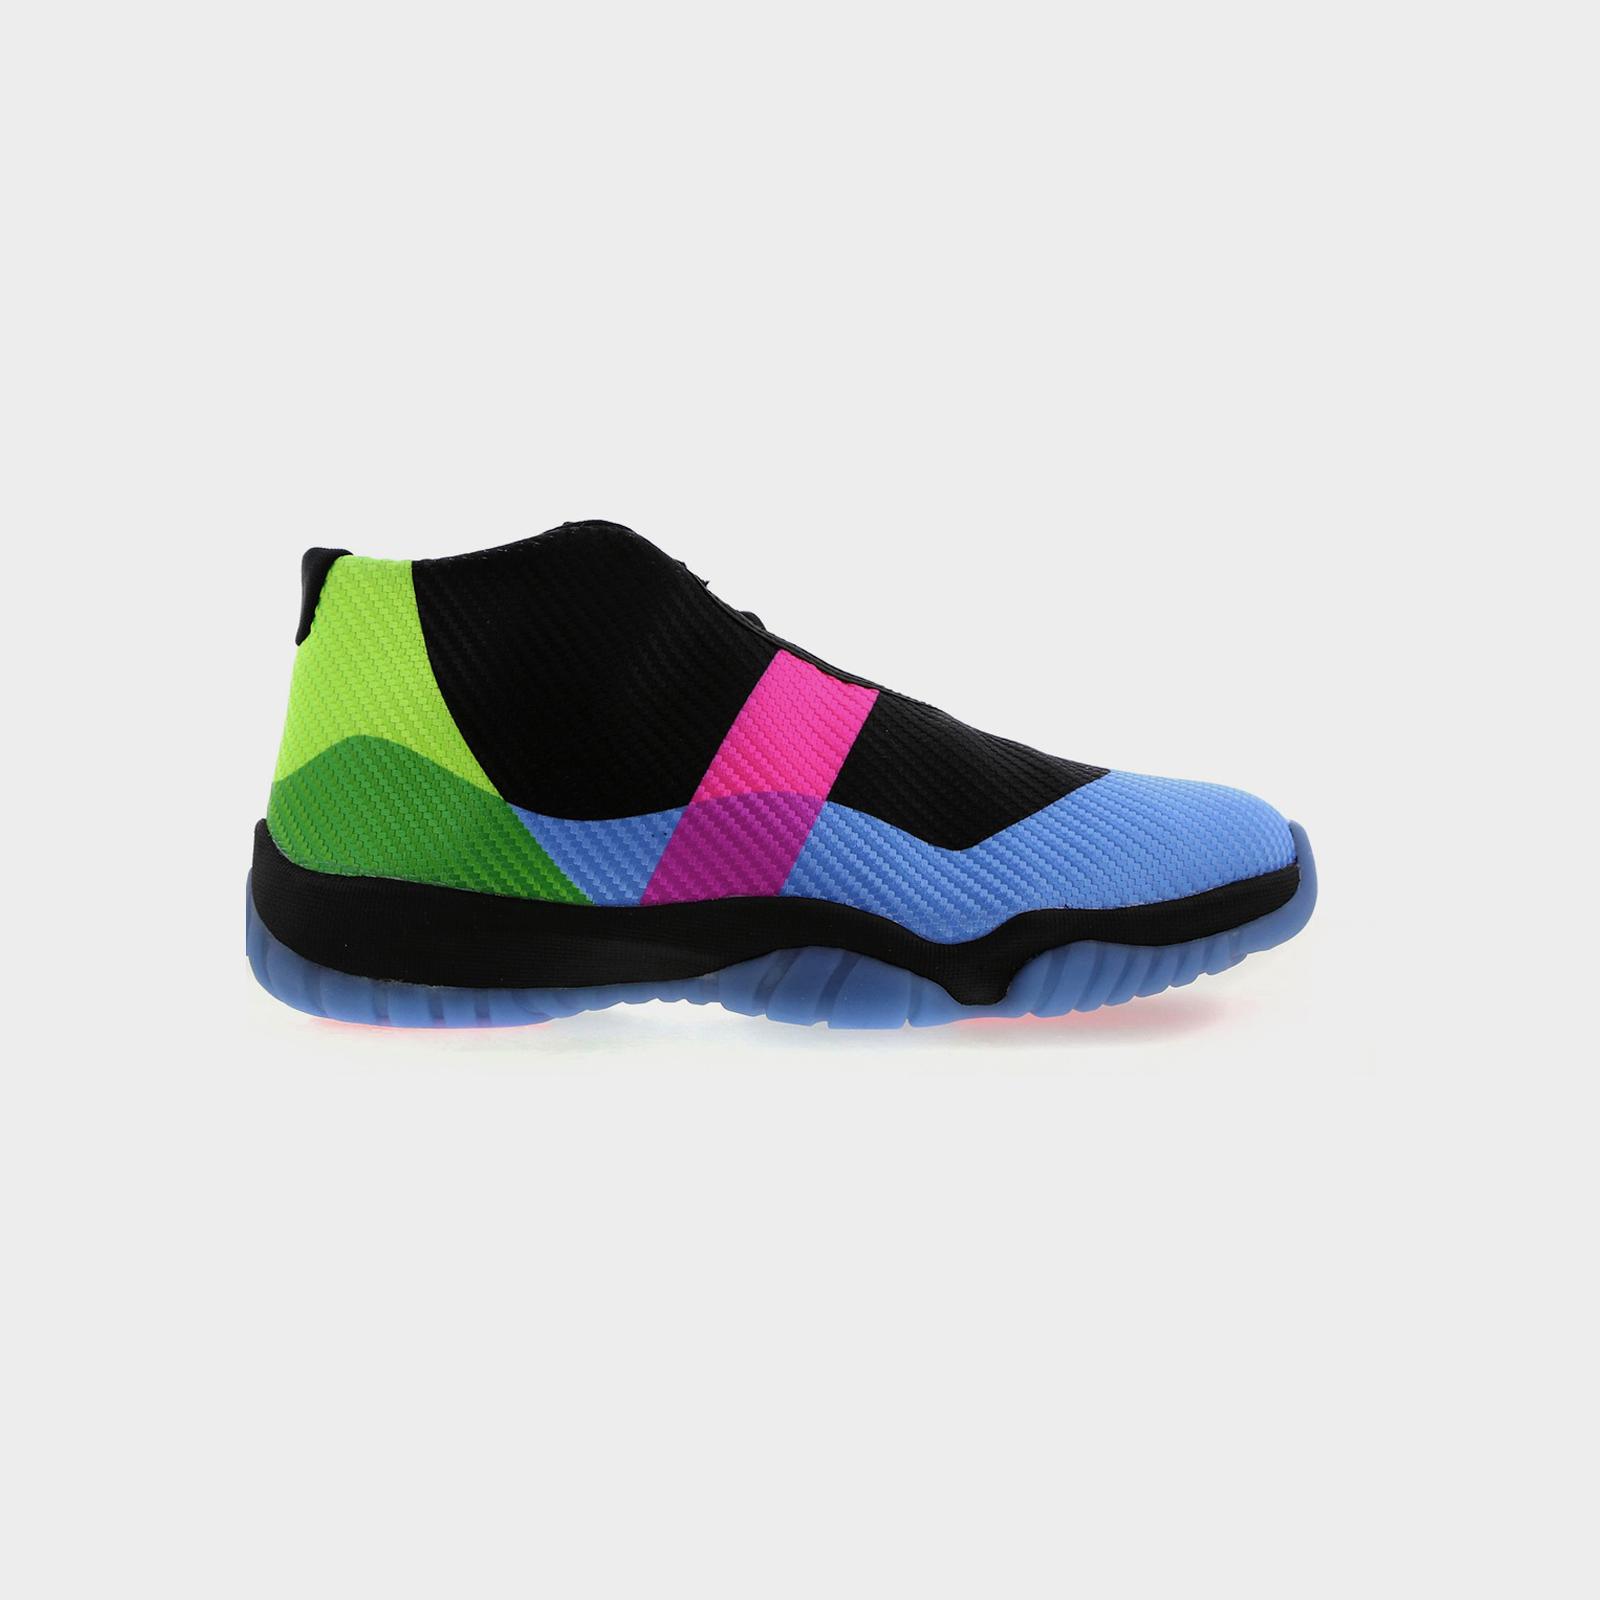 en soldes 09f14 9ed73 Jordan Brand Air Jordan Future Q54 - At9191-001 ...